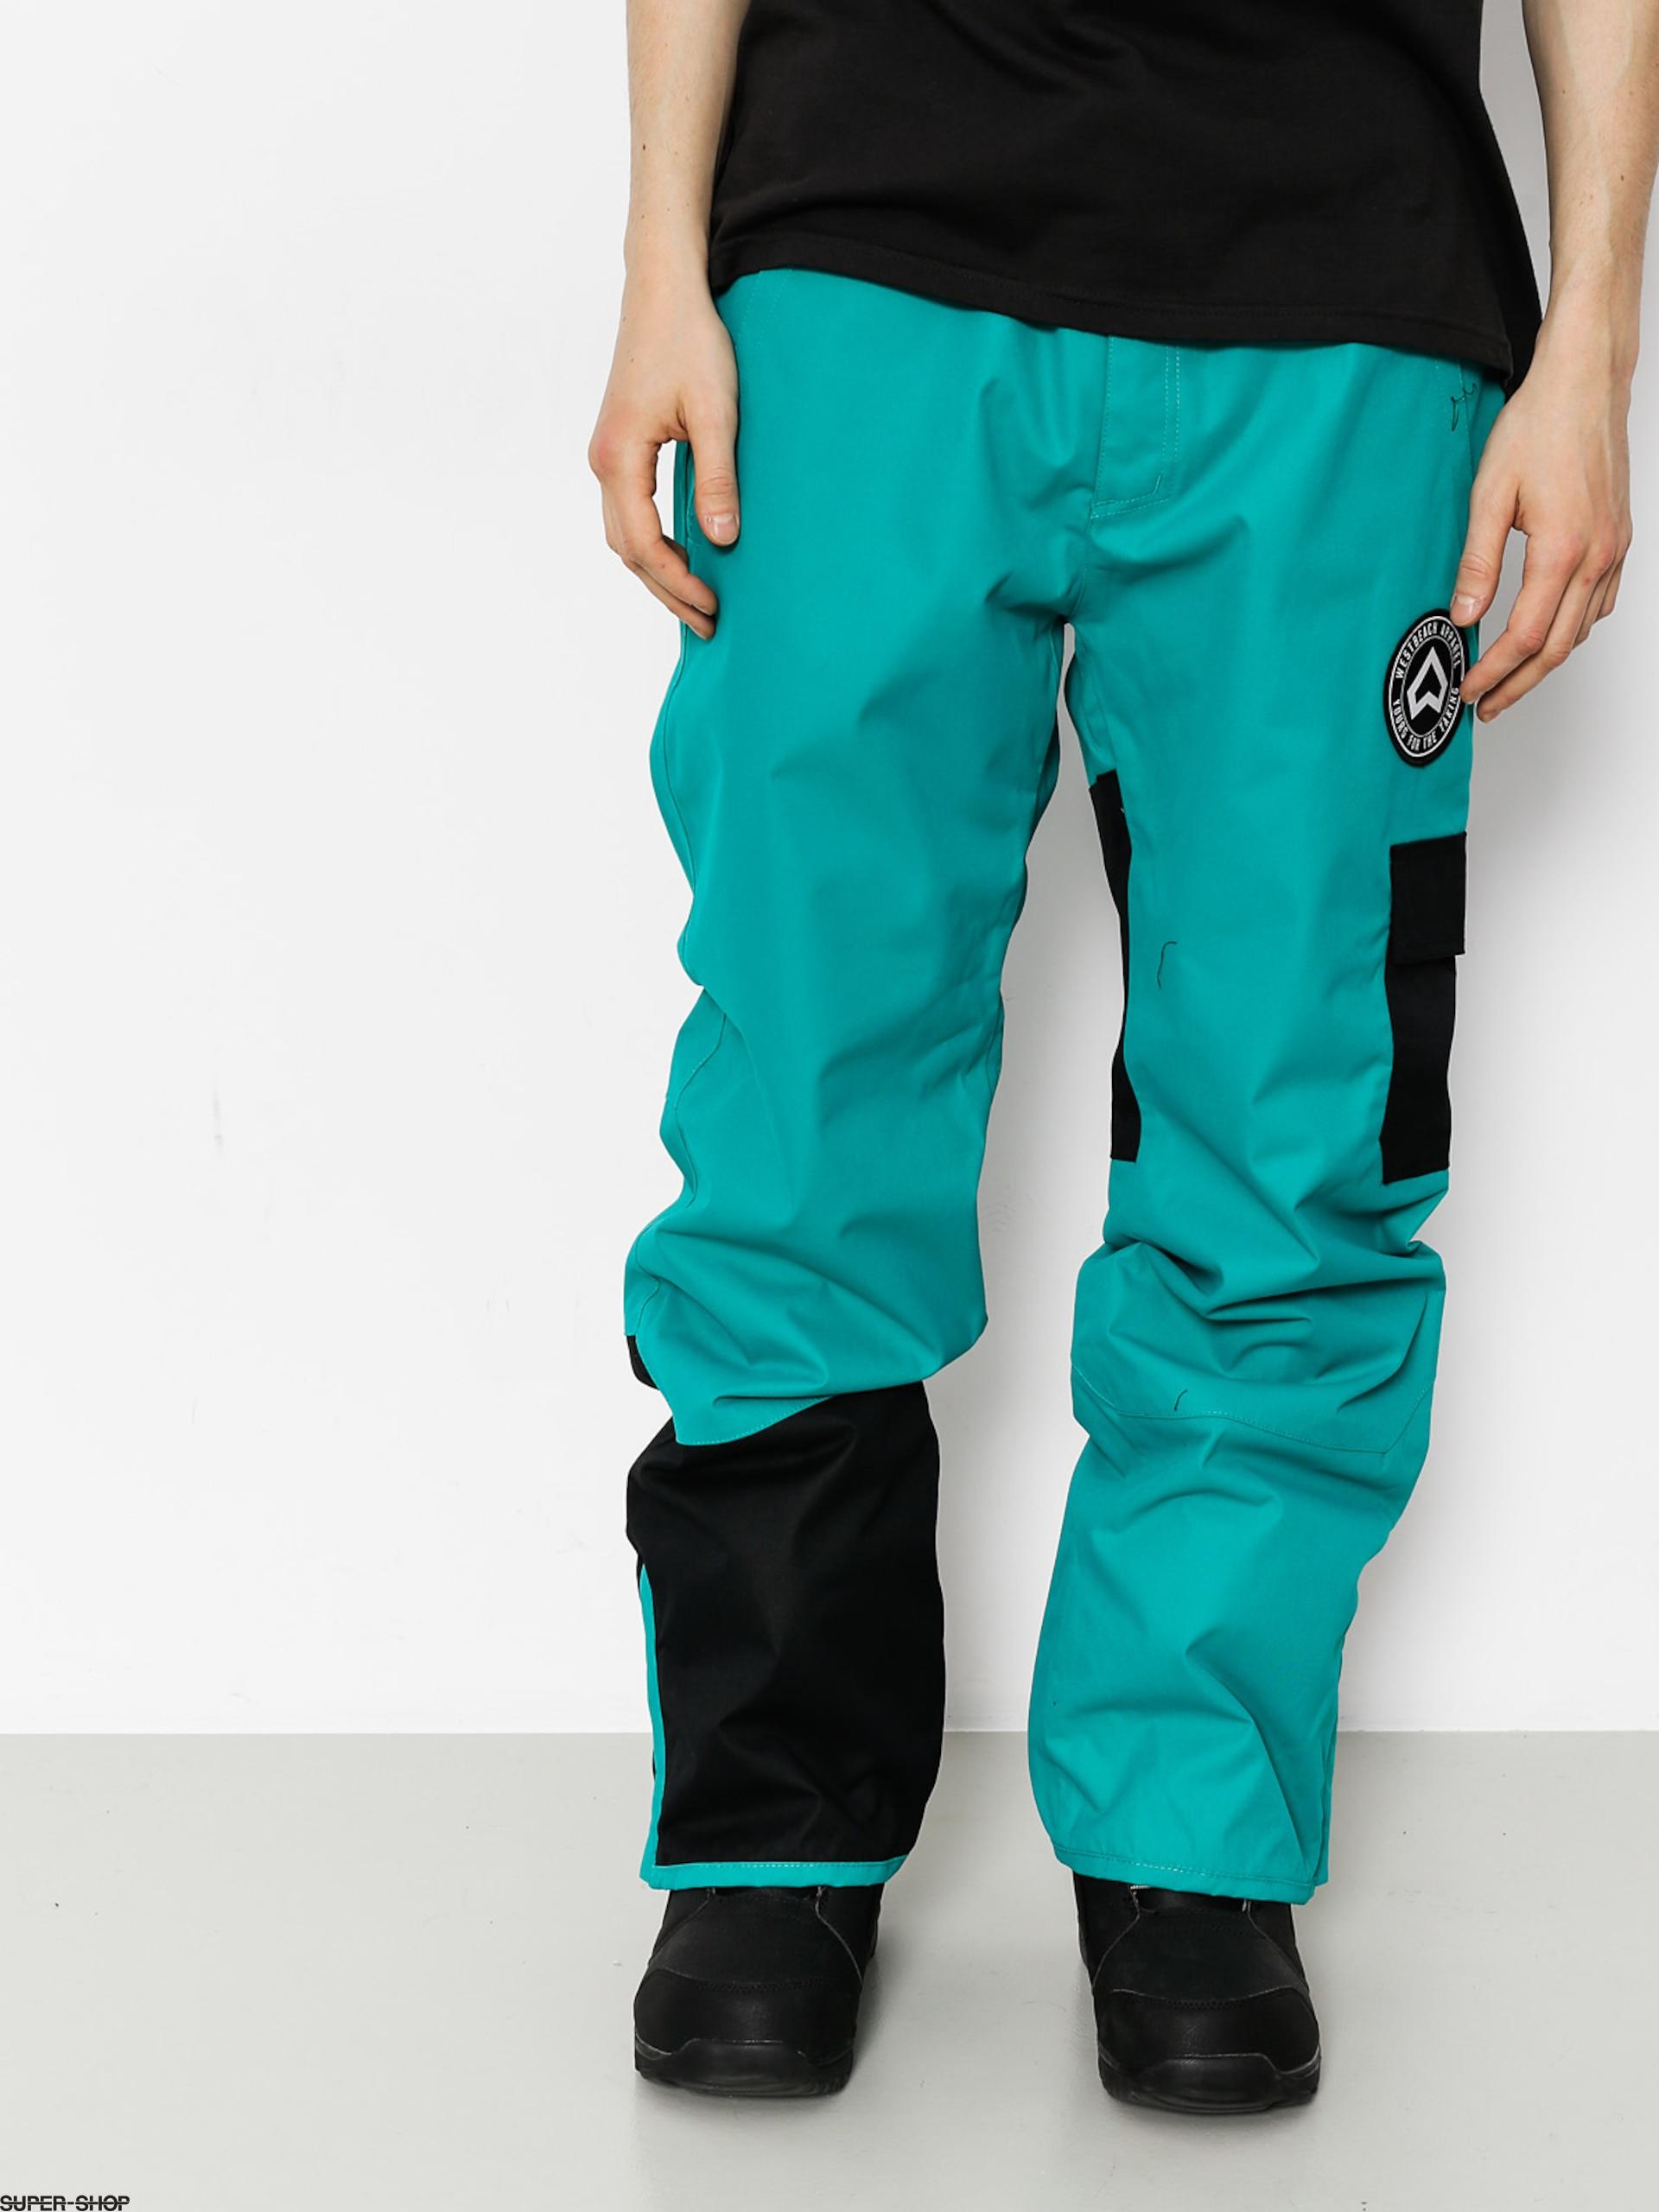 648b44393 Westbeach Snowboard pants Upstart Pant (dark teal)